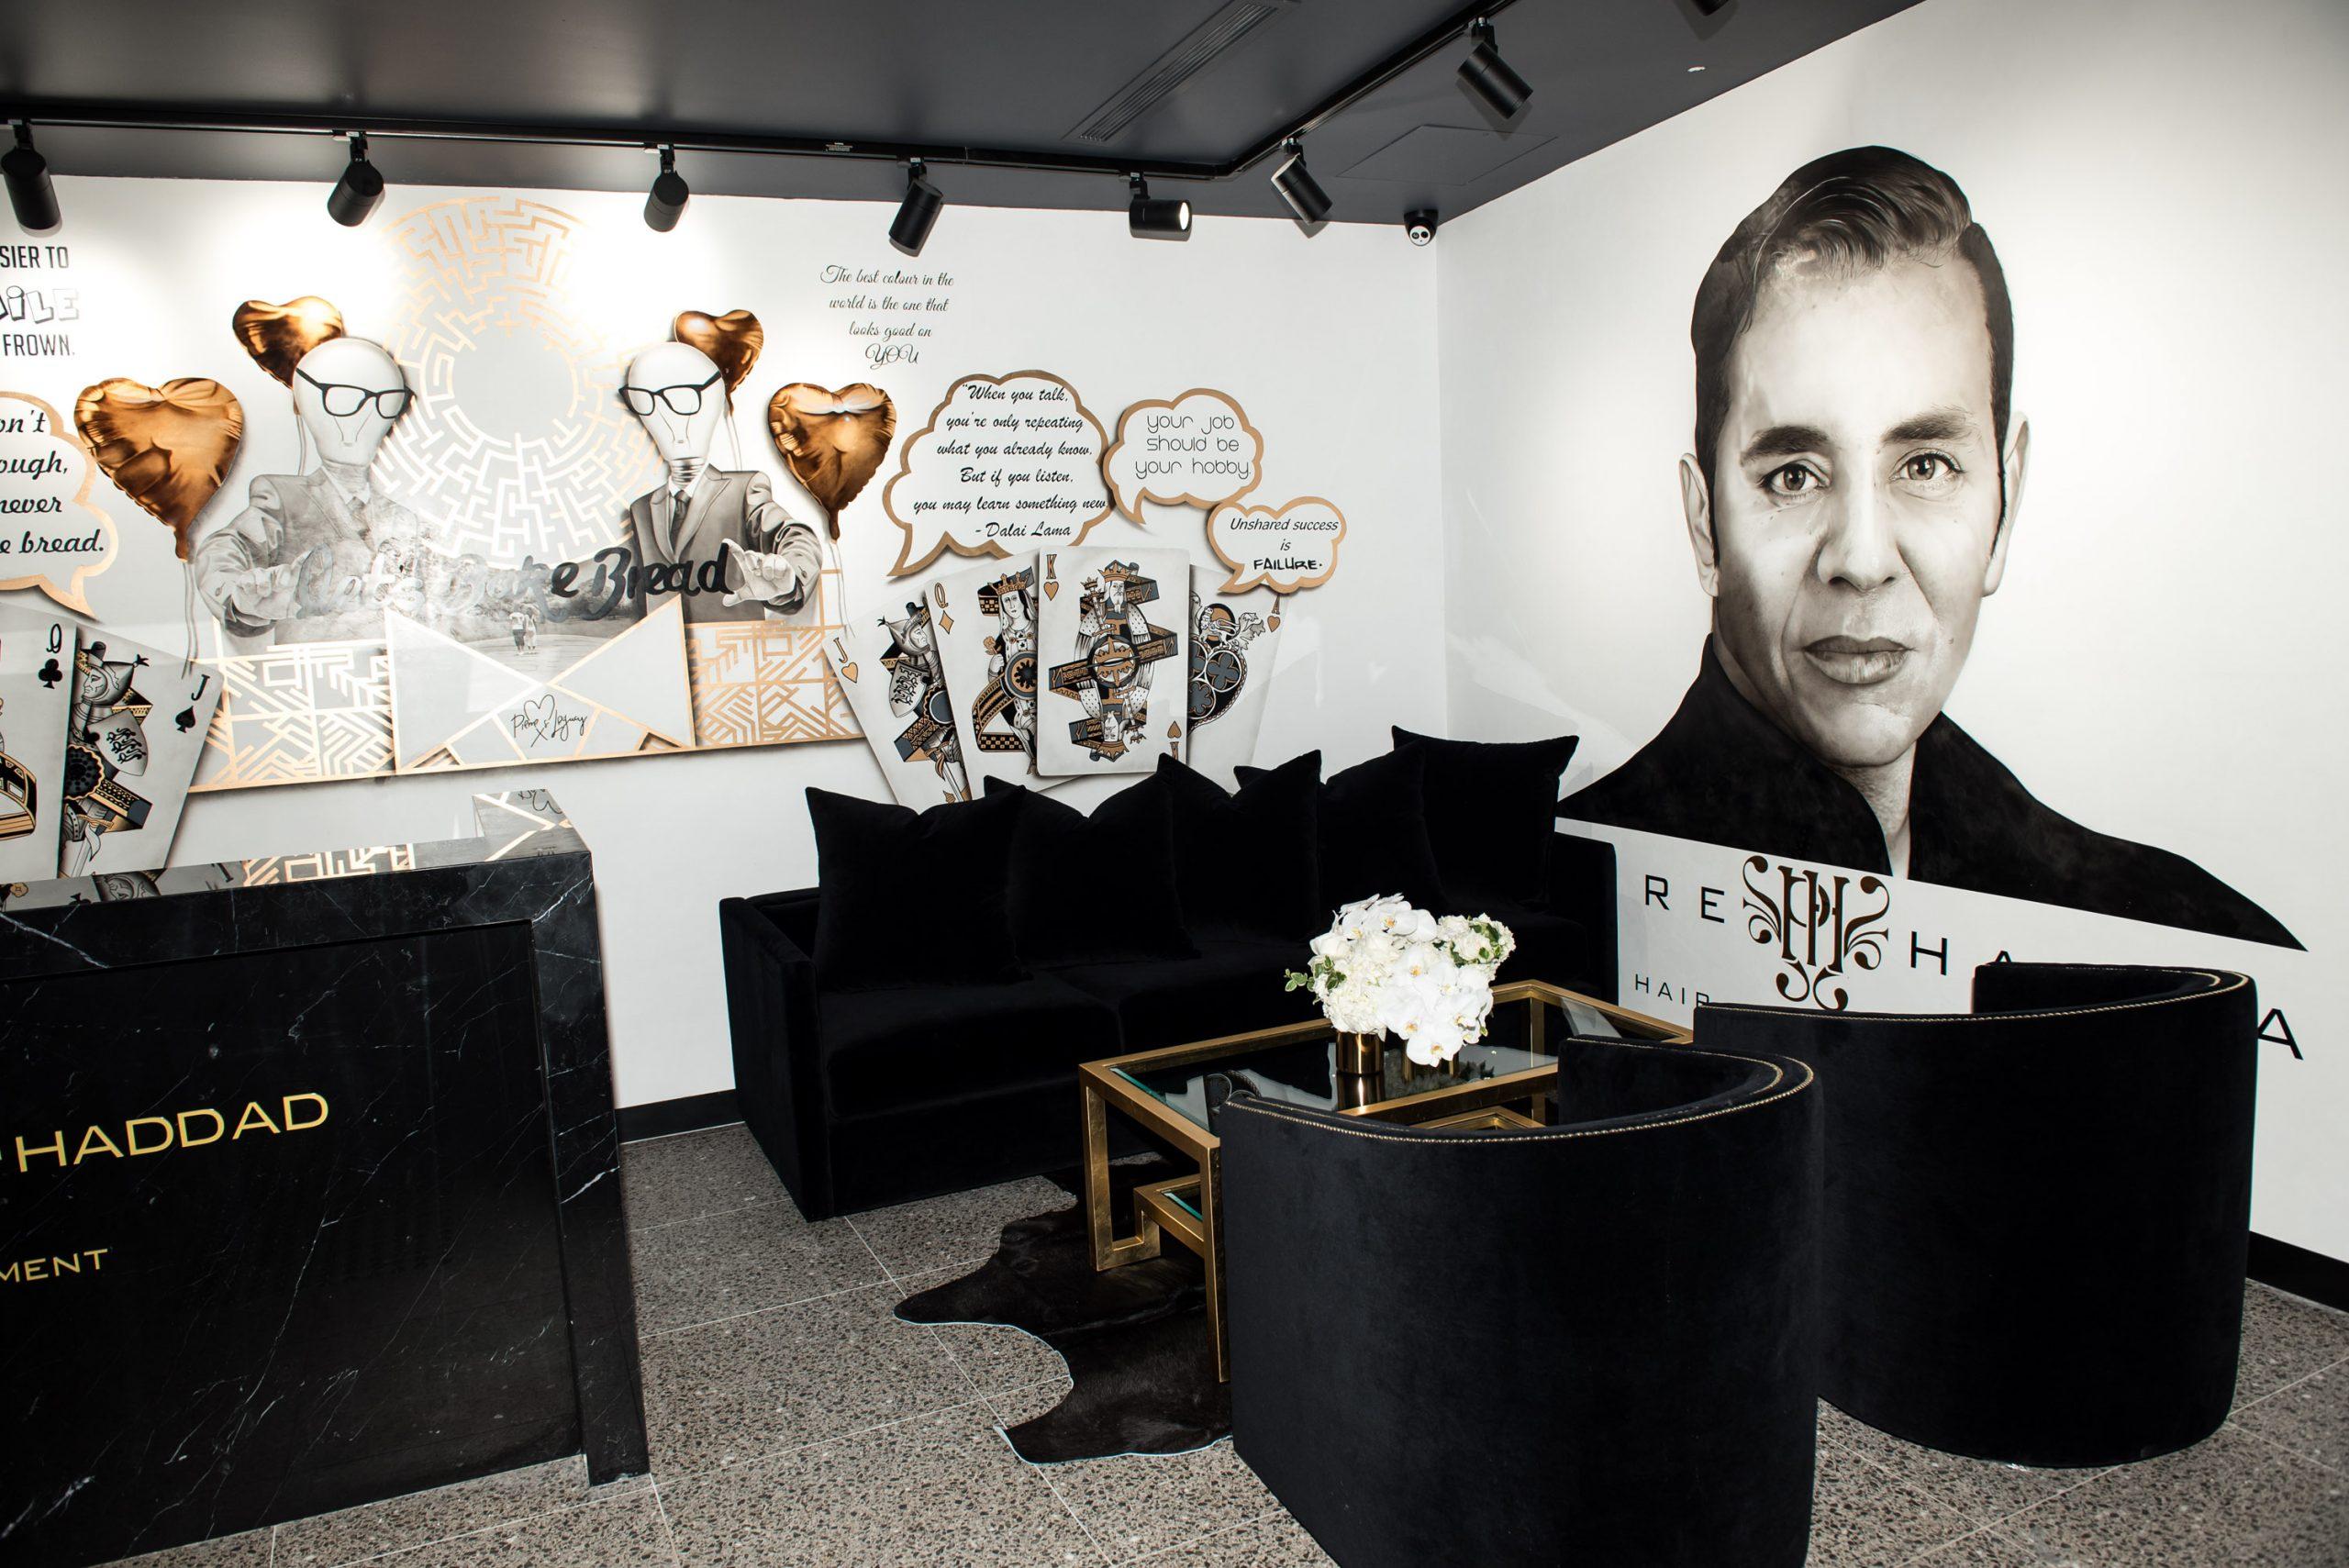 The Salon Review: Pierre Haddad, Sydney